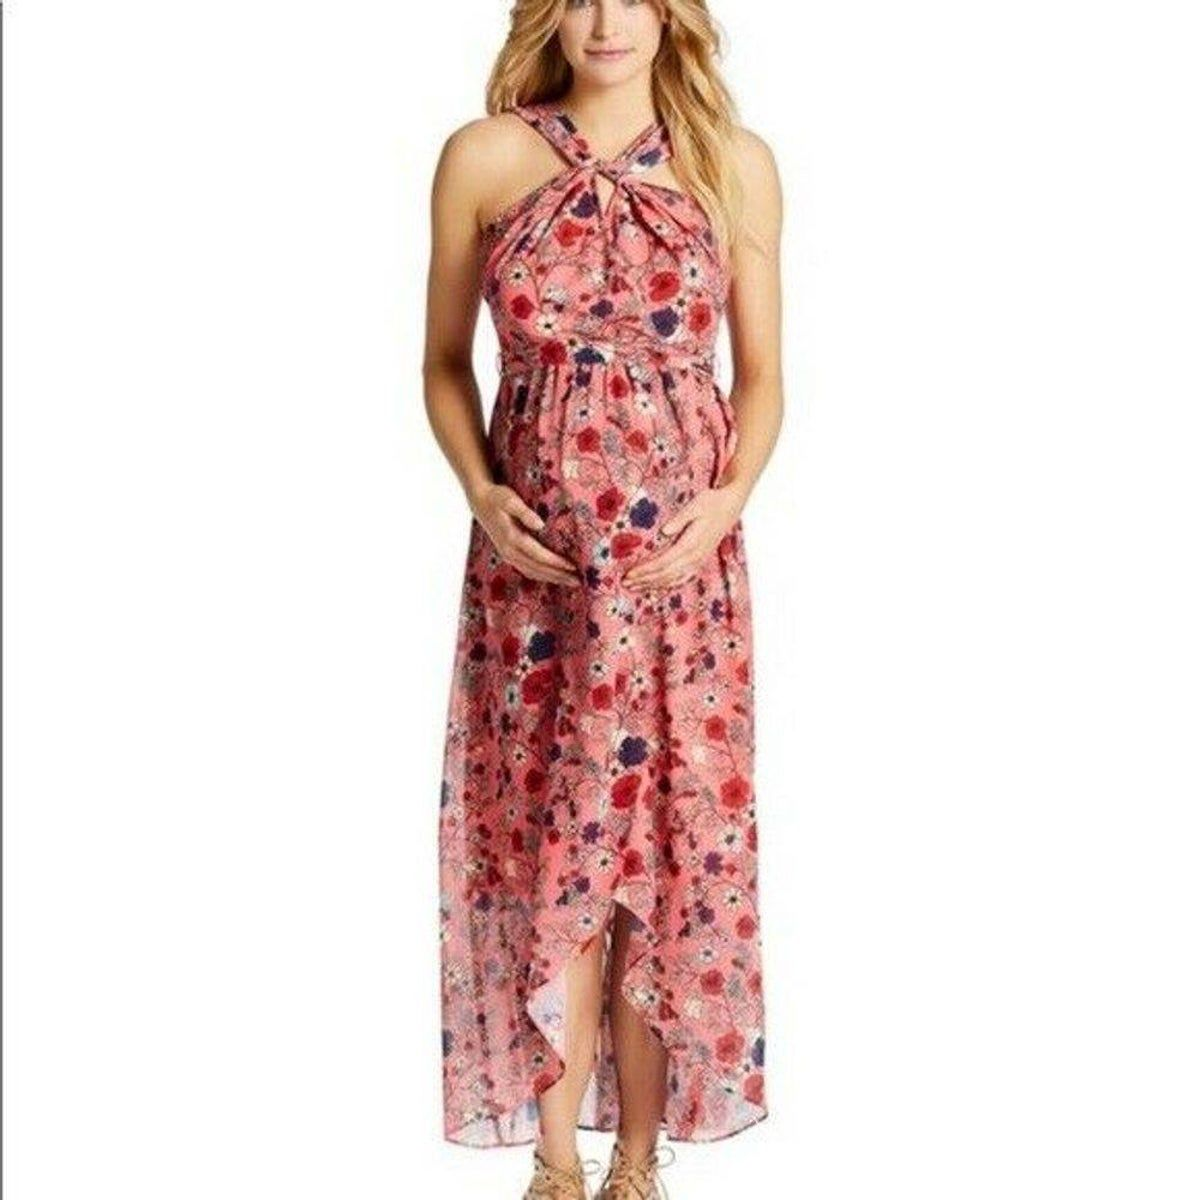 Jessica Simpson Maternity Maxi Dress XL